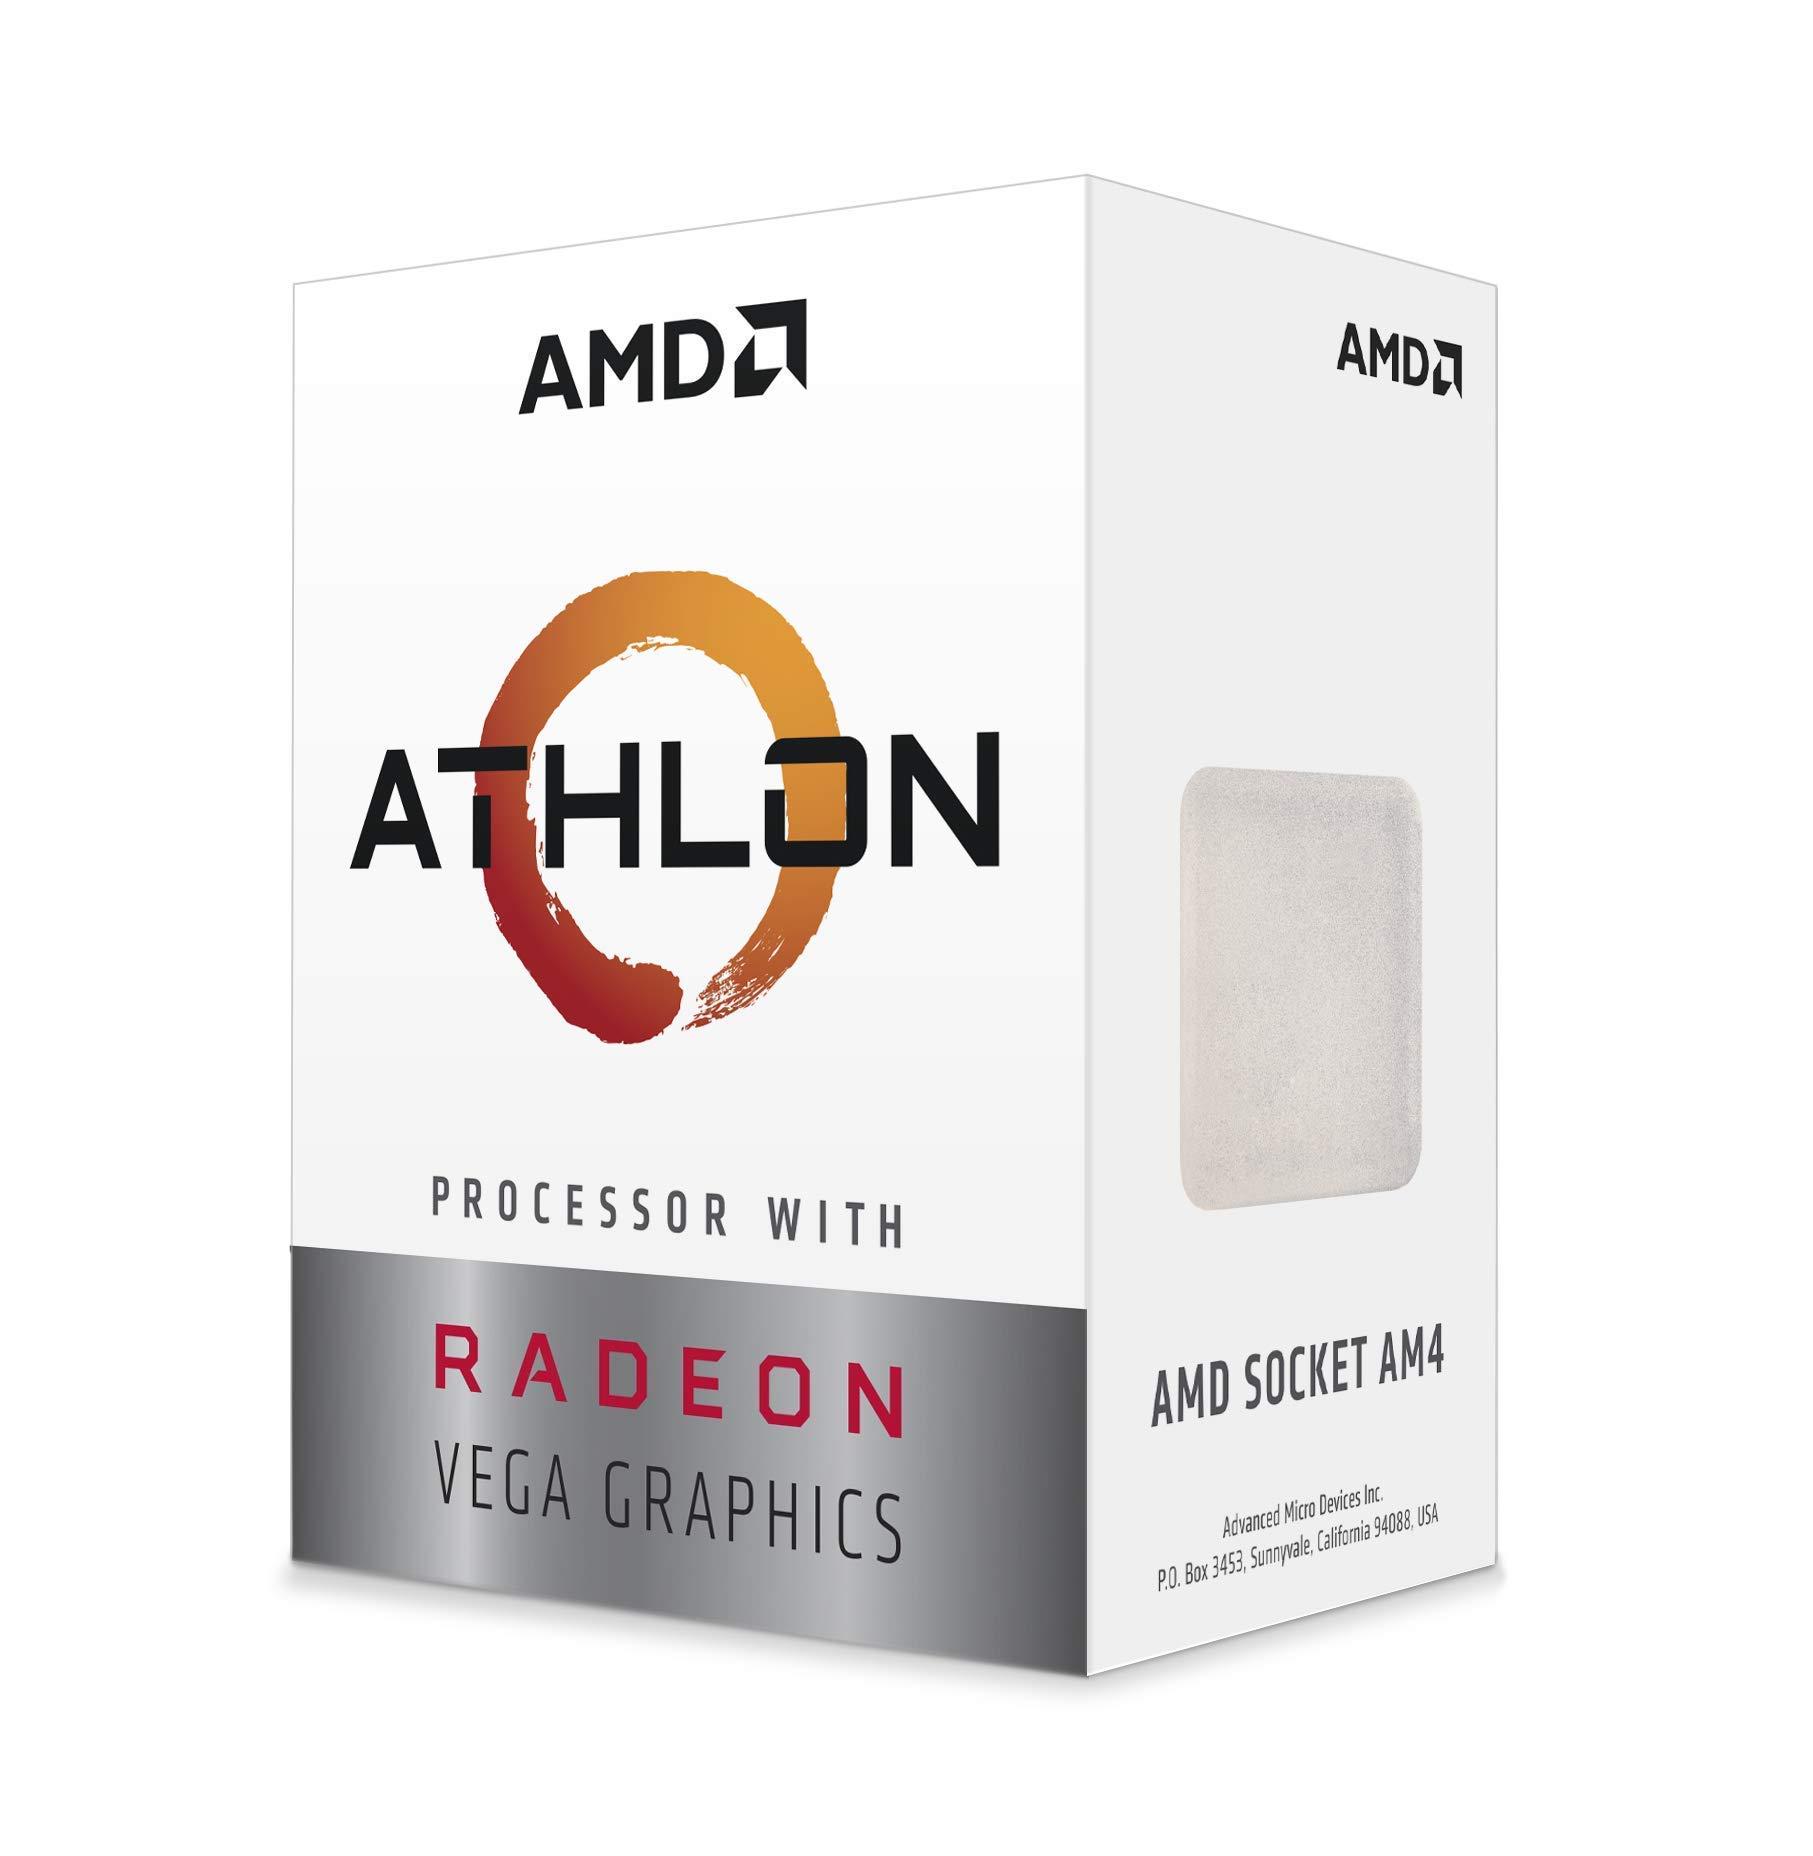 AMD Athlon 200GE 2-Core 4-Thread AM4 Socket Desktop Processor with Radeon Vega Graphics (YD200GC6FBBOX) by AMD